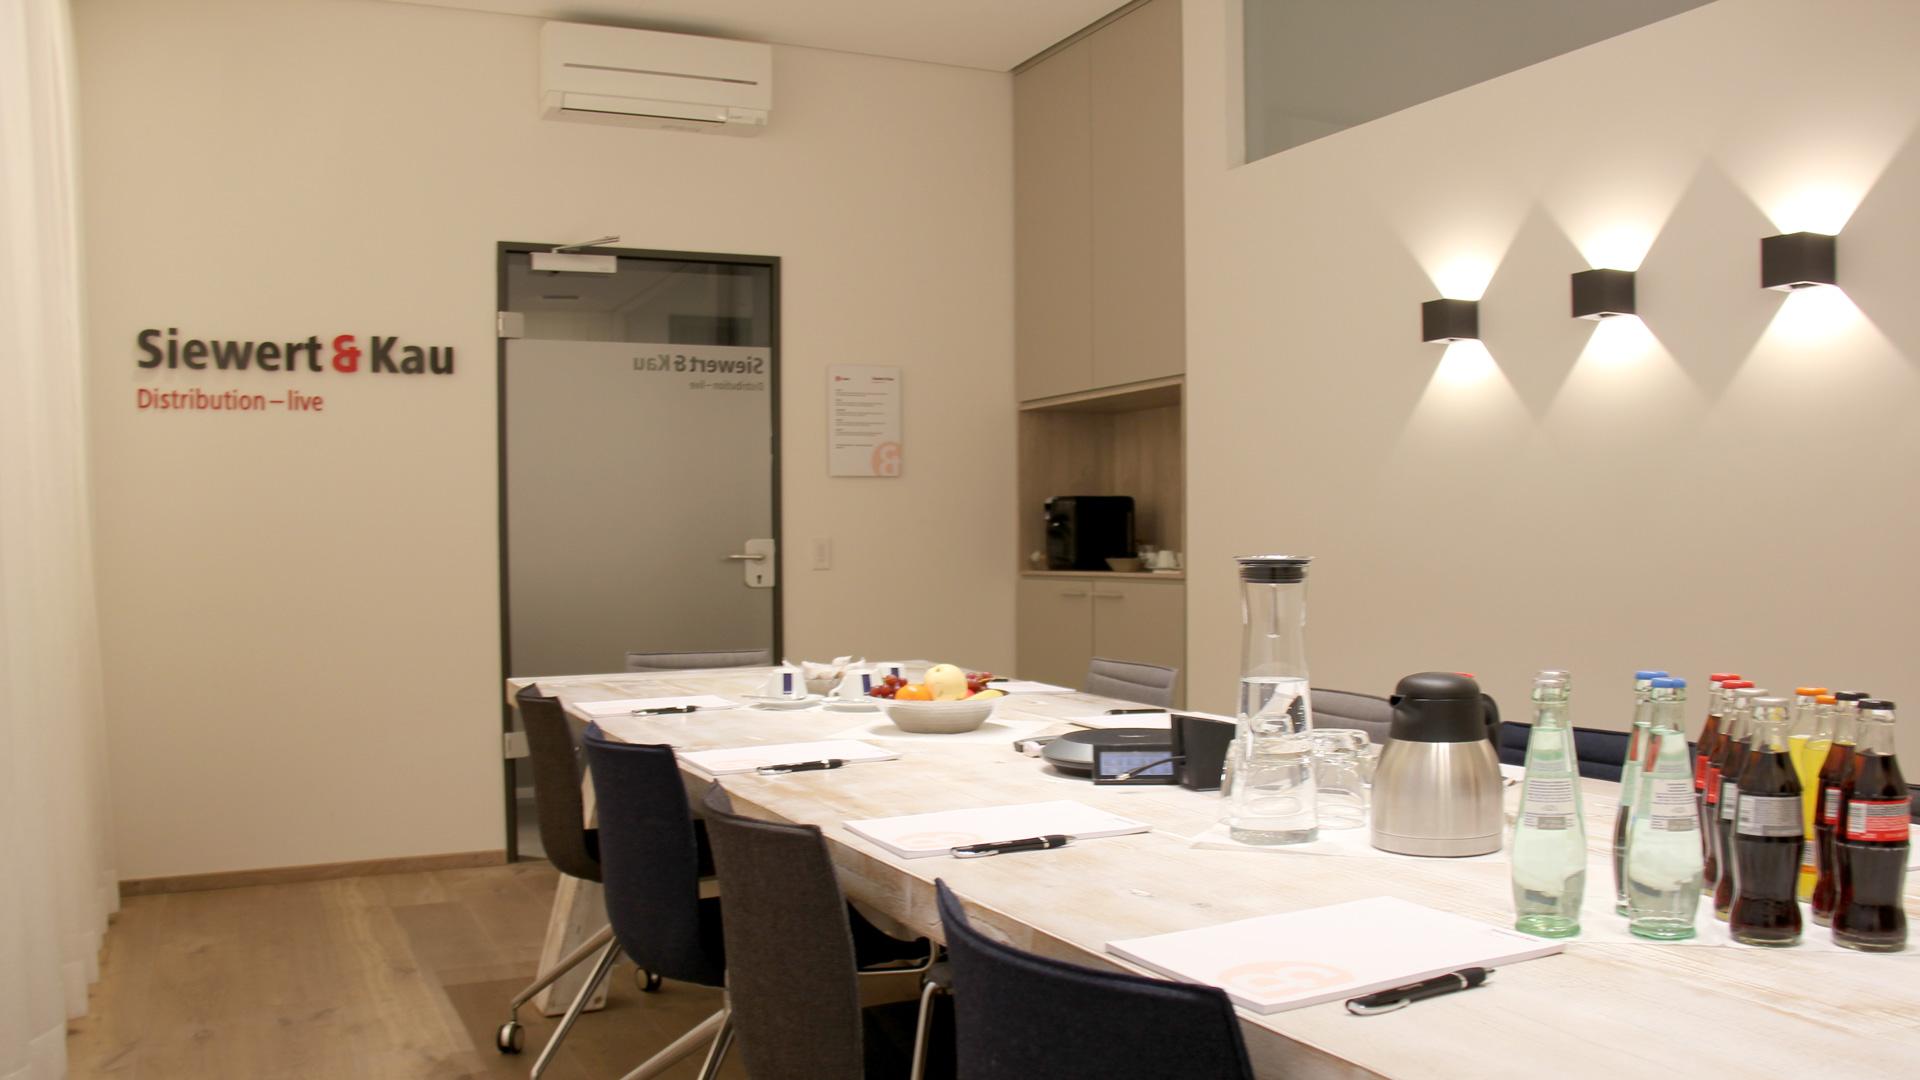 Siewert & Kau Academy - Raumvermietung Schulungsraum Bern 1